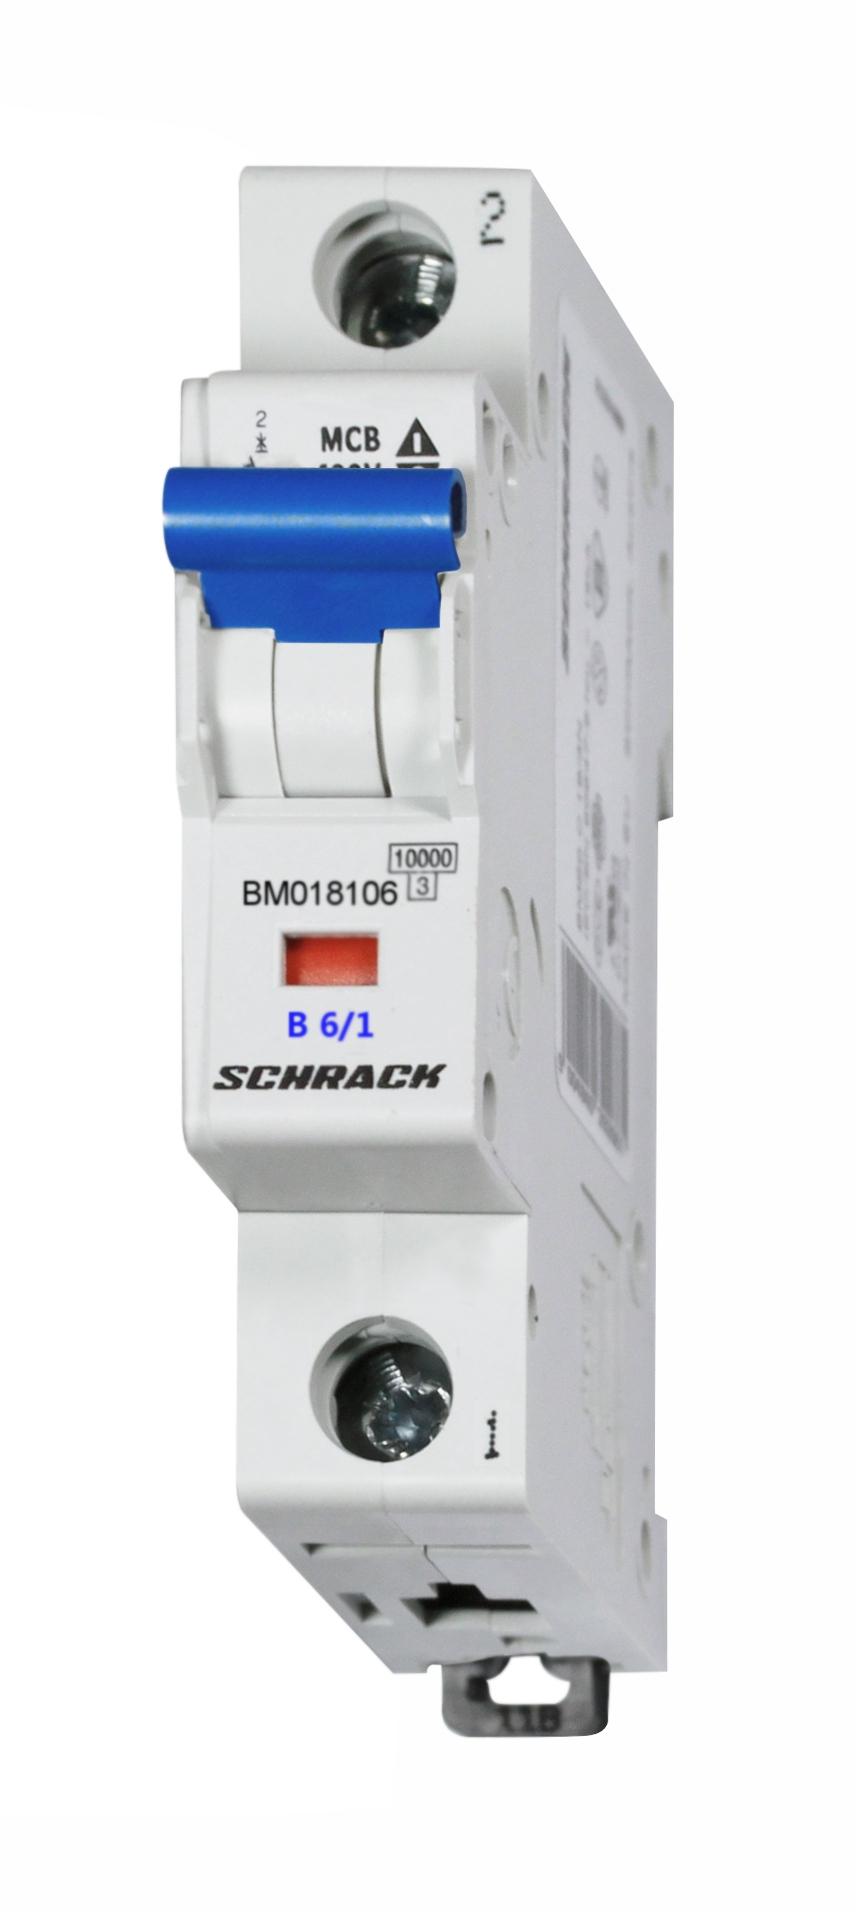 BM018106 - Schrack Technik